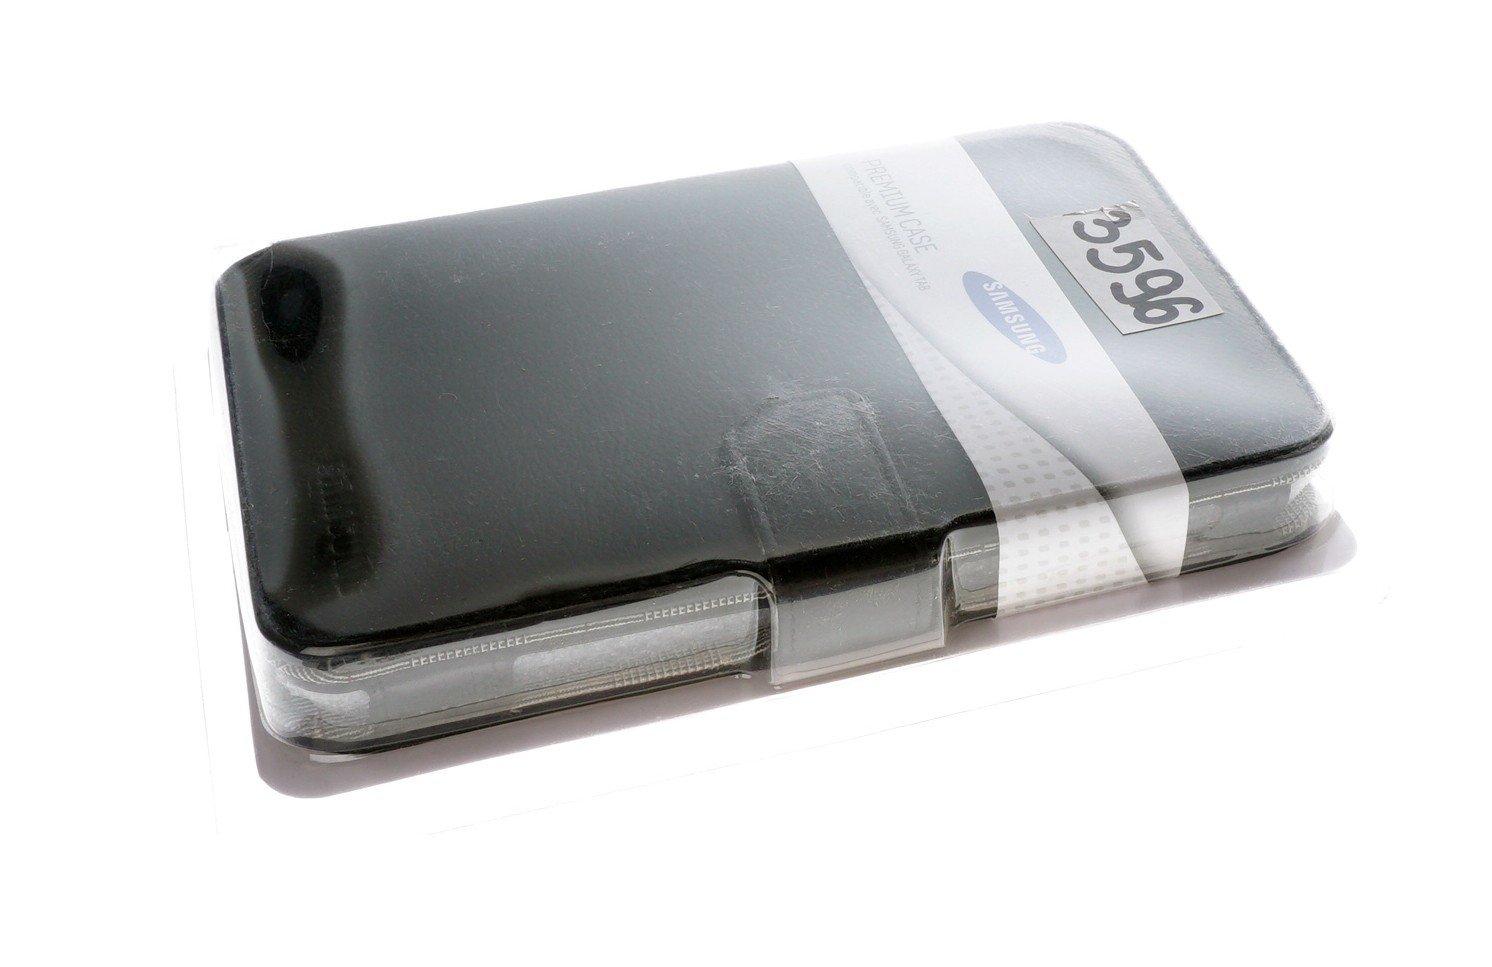 Pokrowiec Samsung Galaxy Tab P1000 P3100 P3110